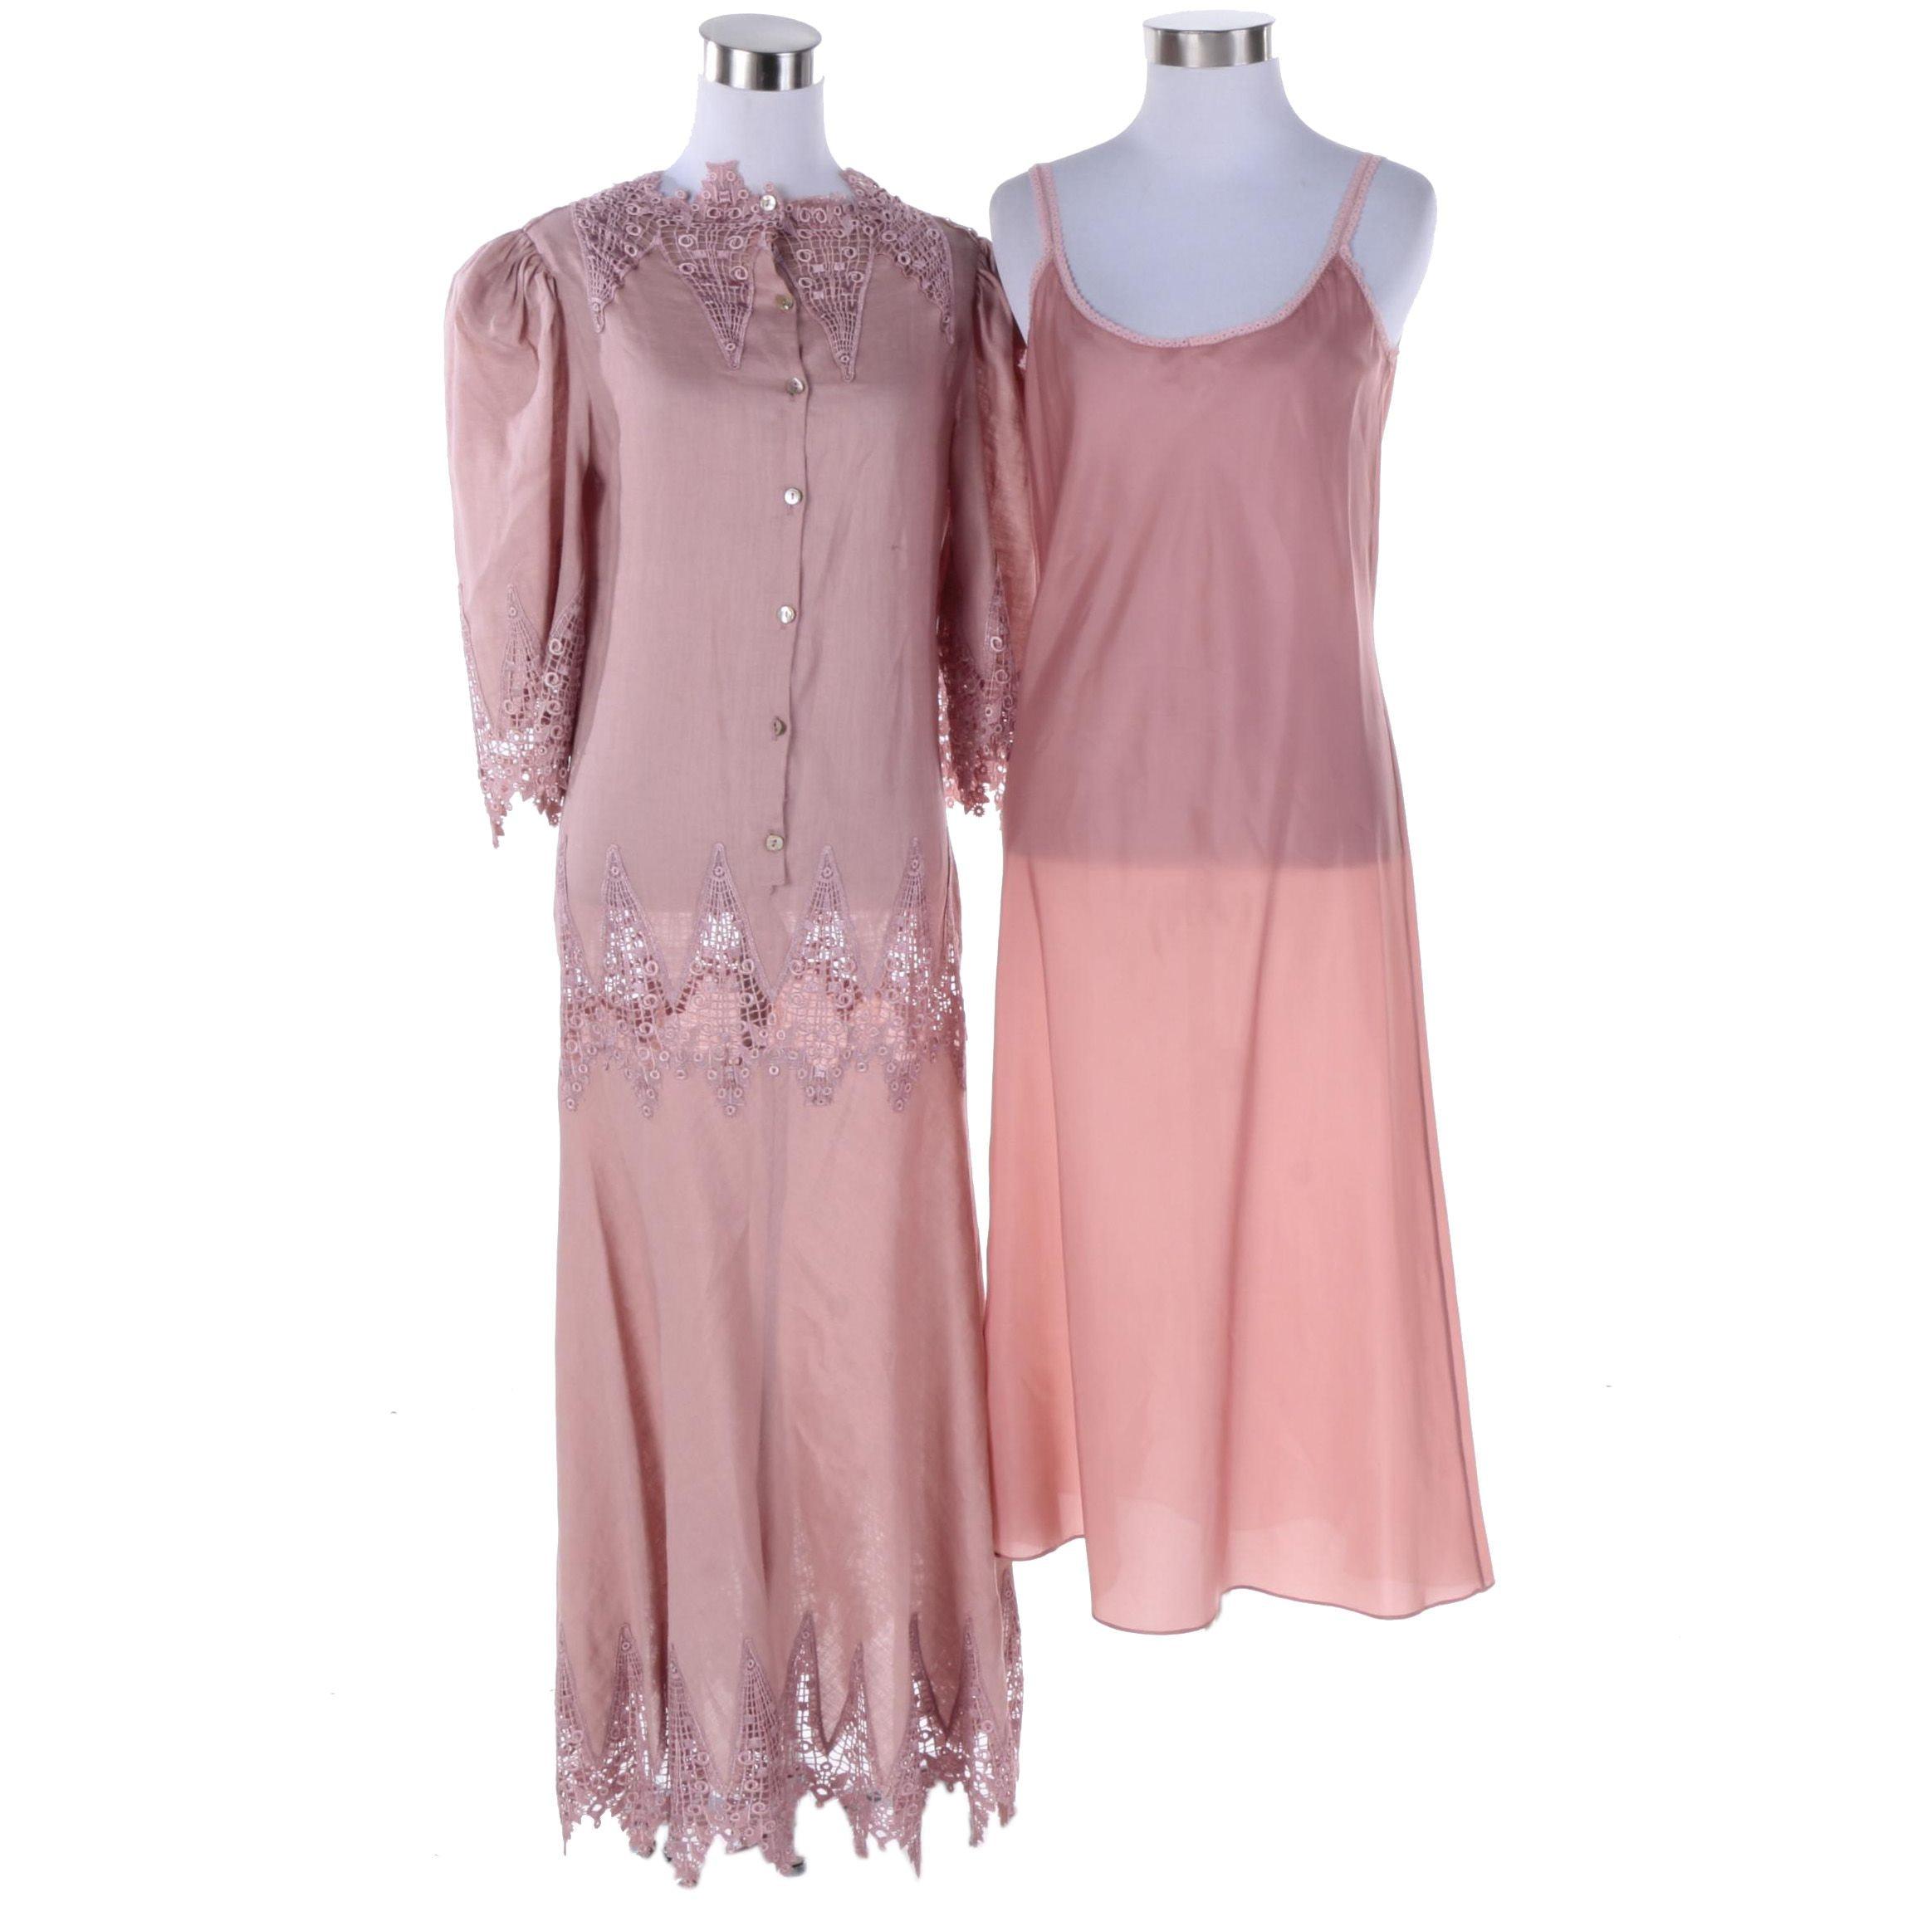 Women's Mauve Dress and Slip